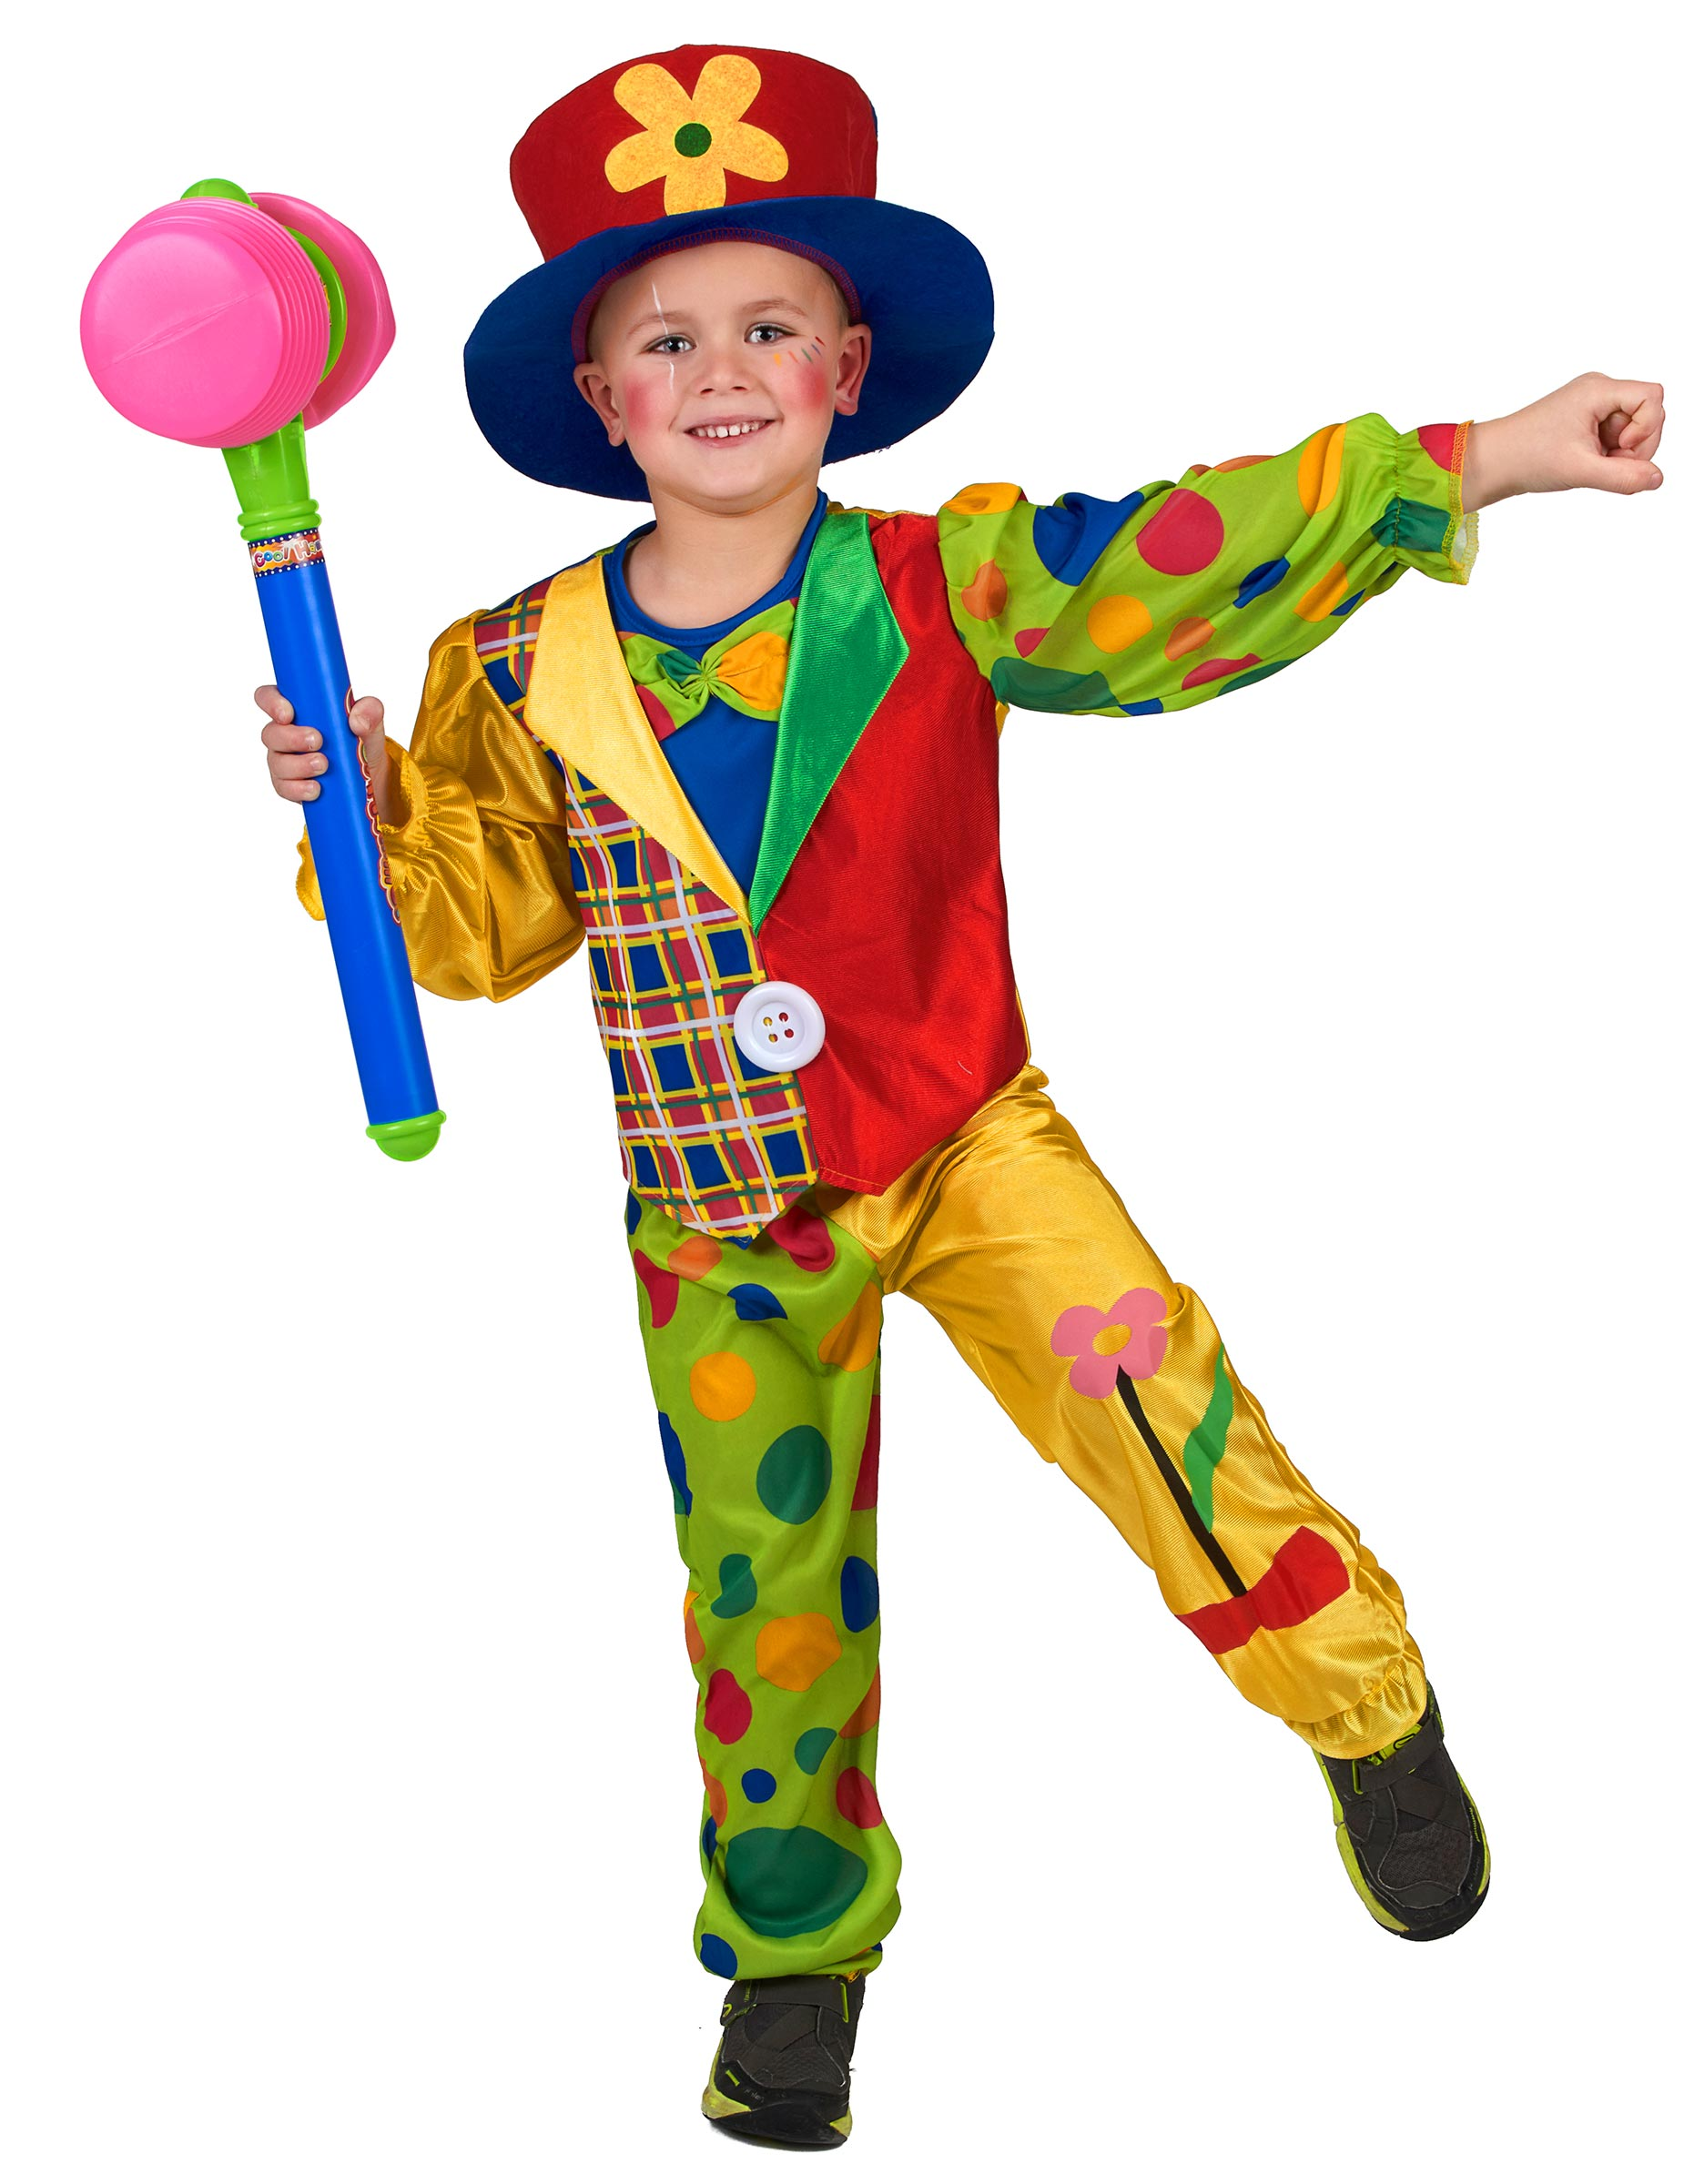 clown kost m f r jungen kost me f r kinder und g nstige faschingskost me vegaoo. Black Bedroom Furniture Sets. Home Design Ideas